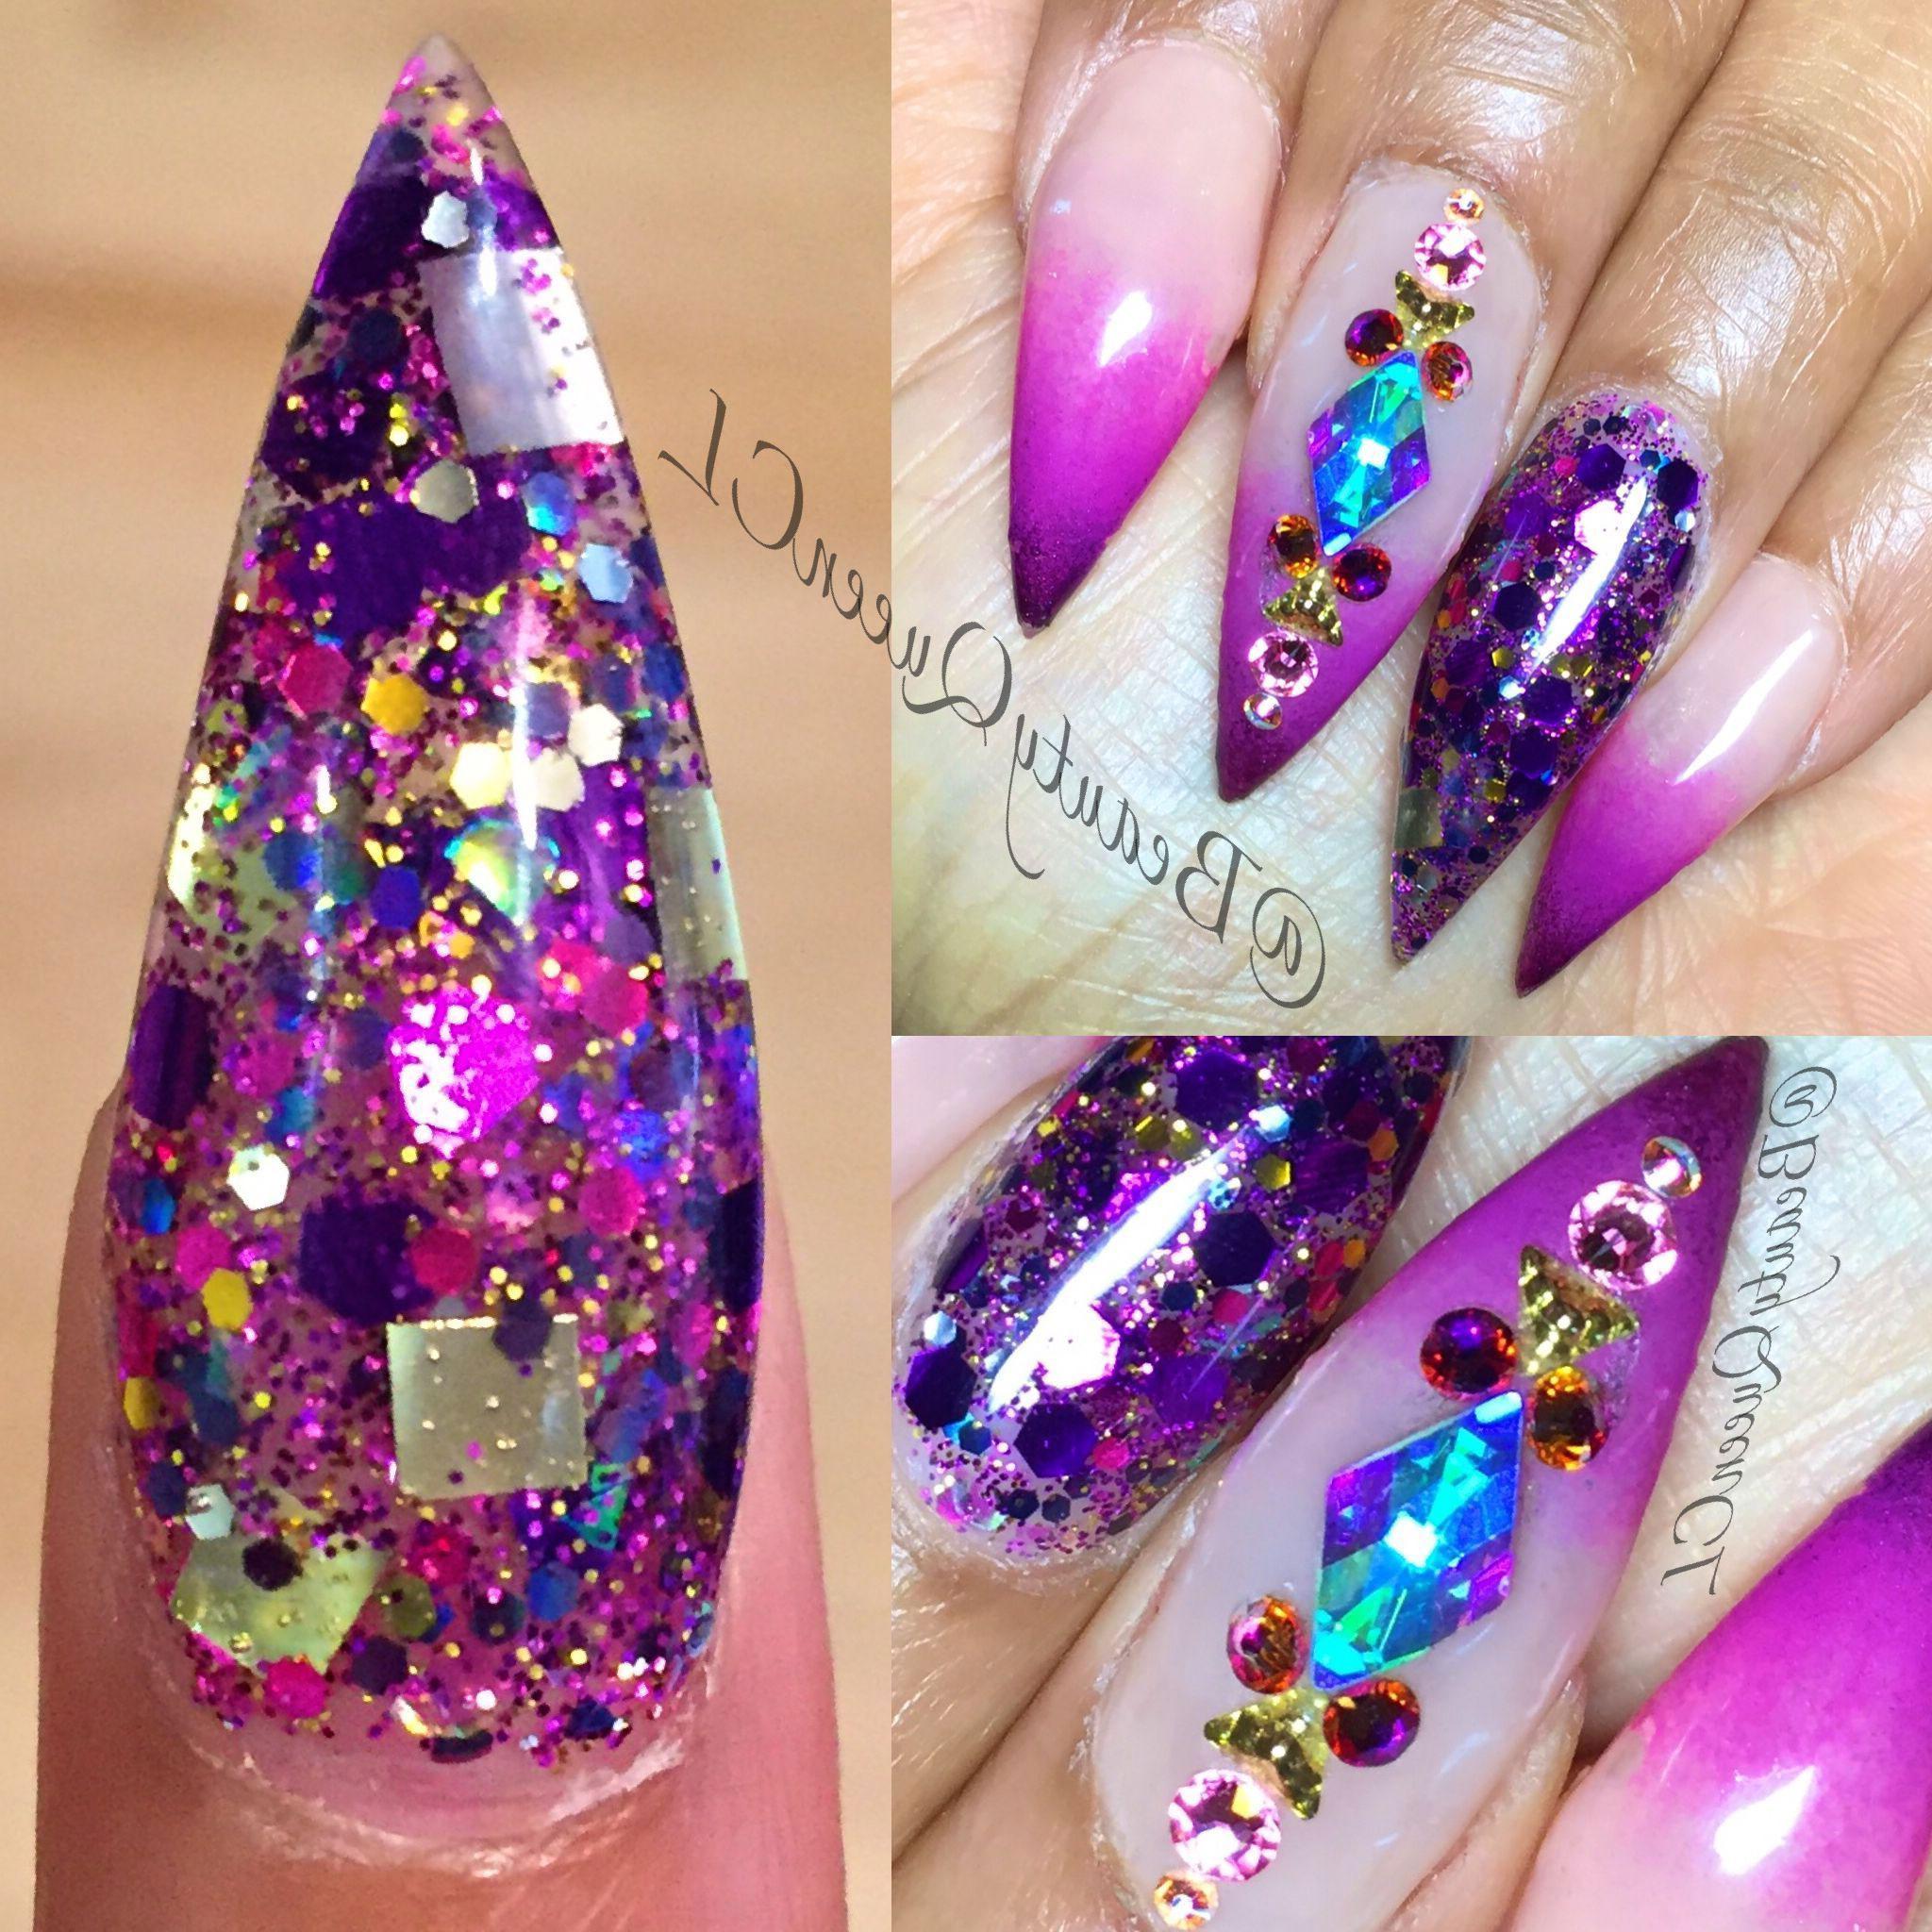 purple-glitter-nail-designs